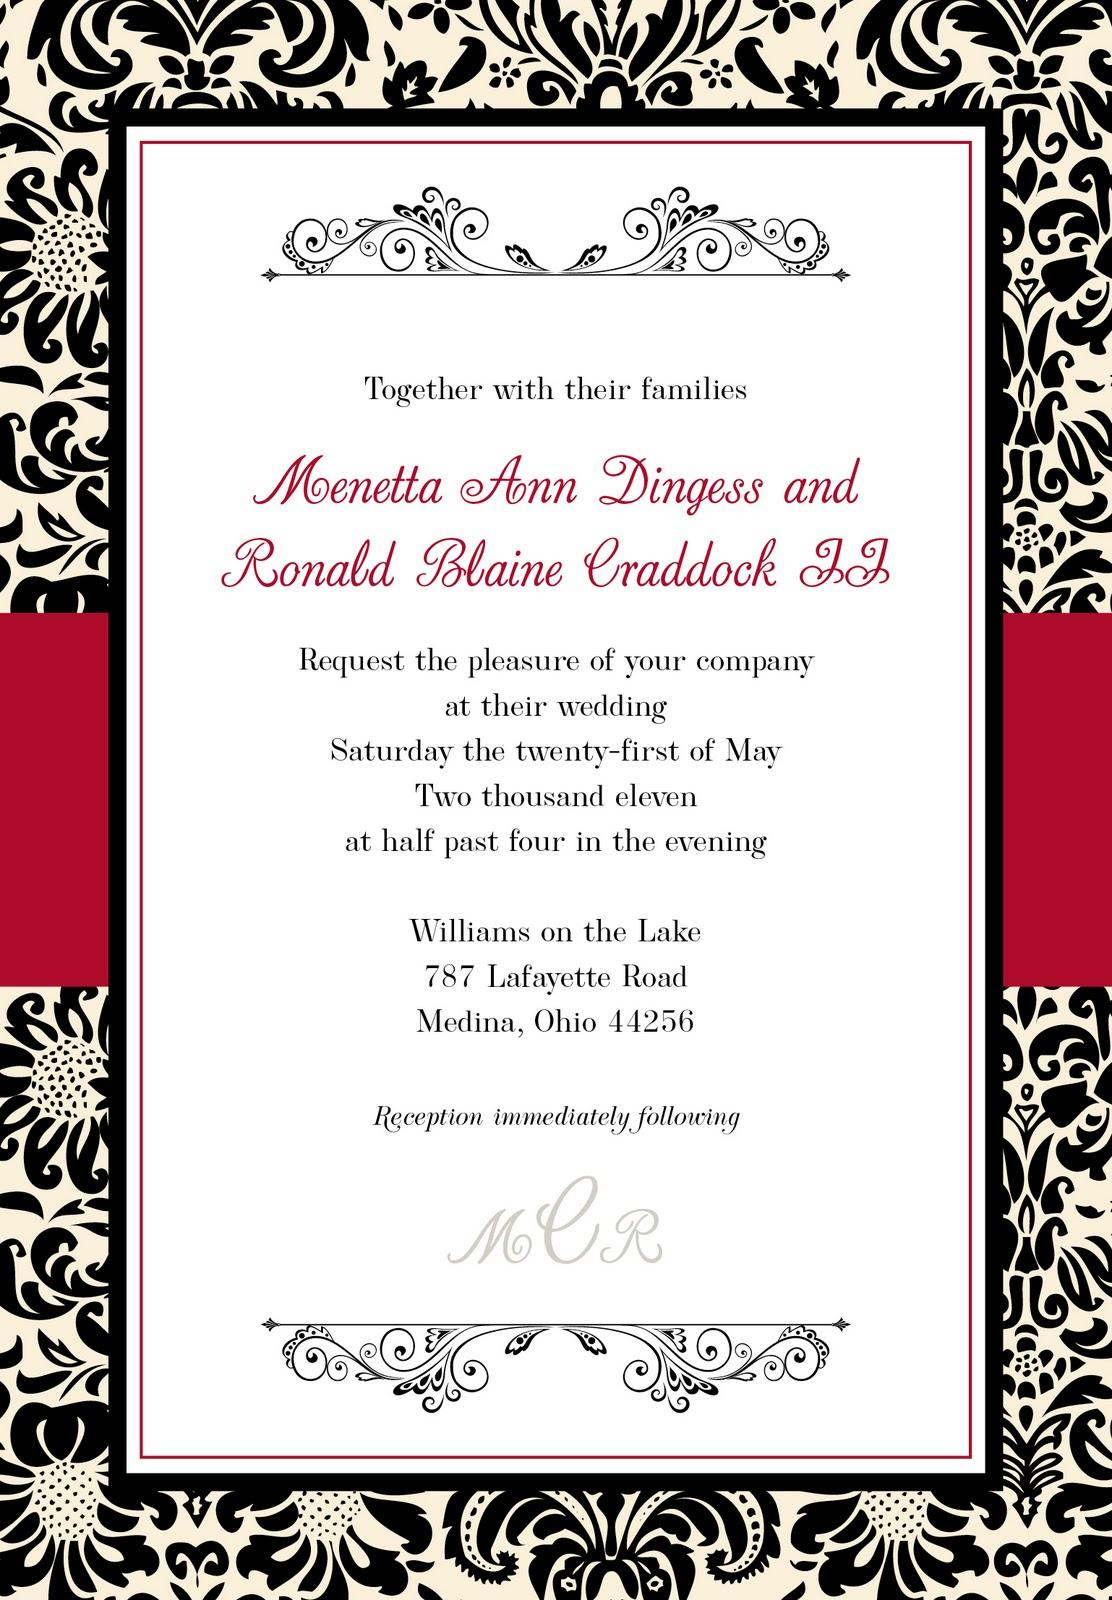 Wedding Invitation Kits Walmart was perfect invitations design